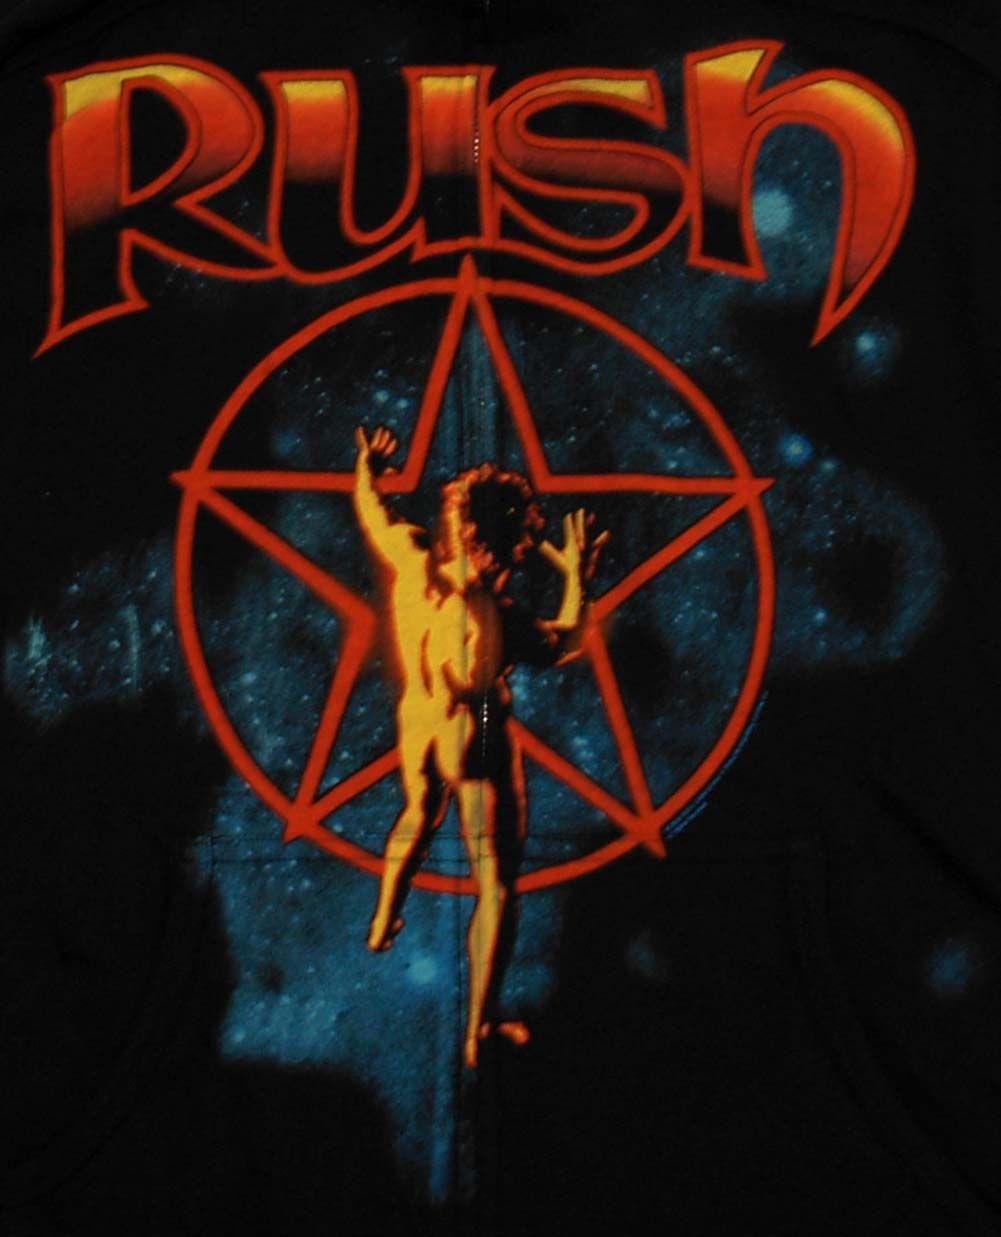 Rush starman images pictures becuo rush the most - Rush album art ...